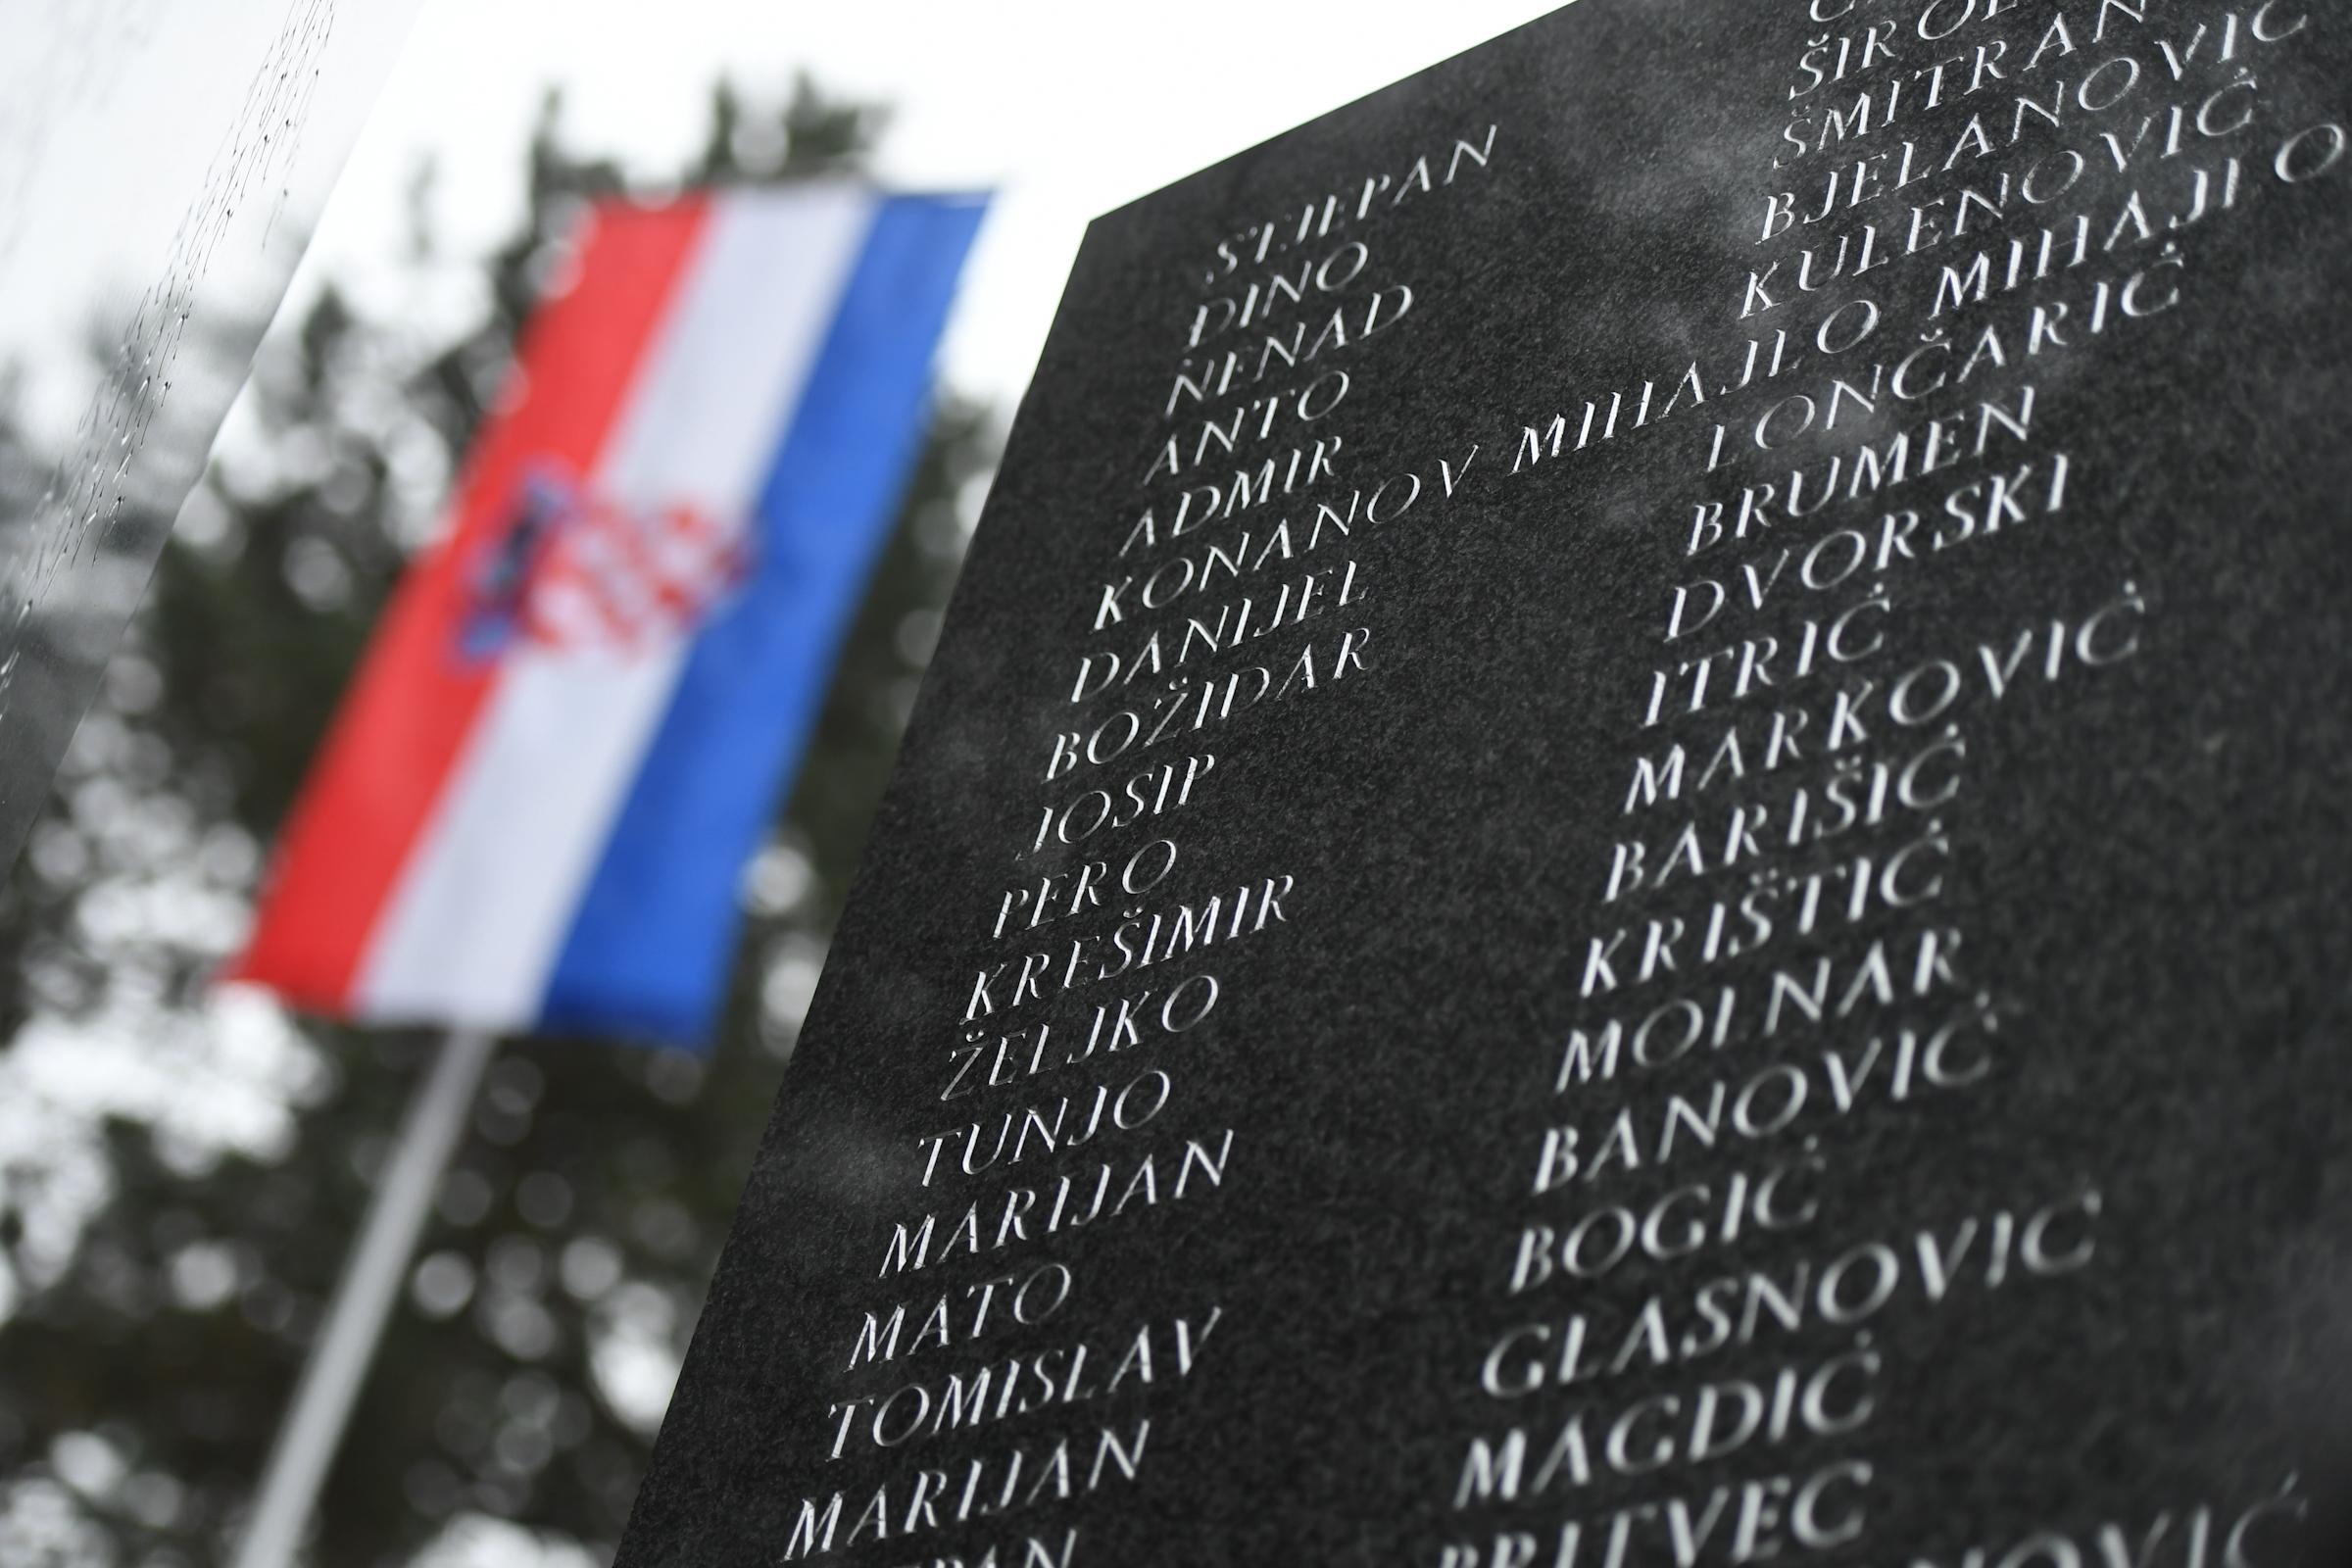 Ministar Banožić na obilježavanju obljetnice Tigrova